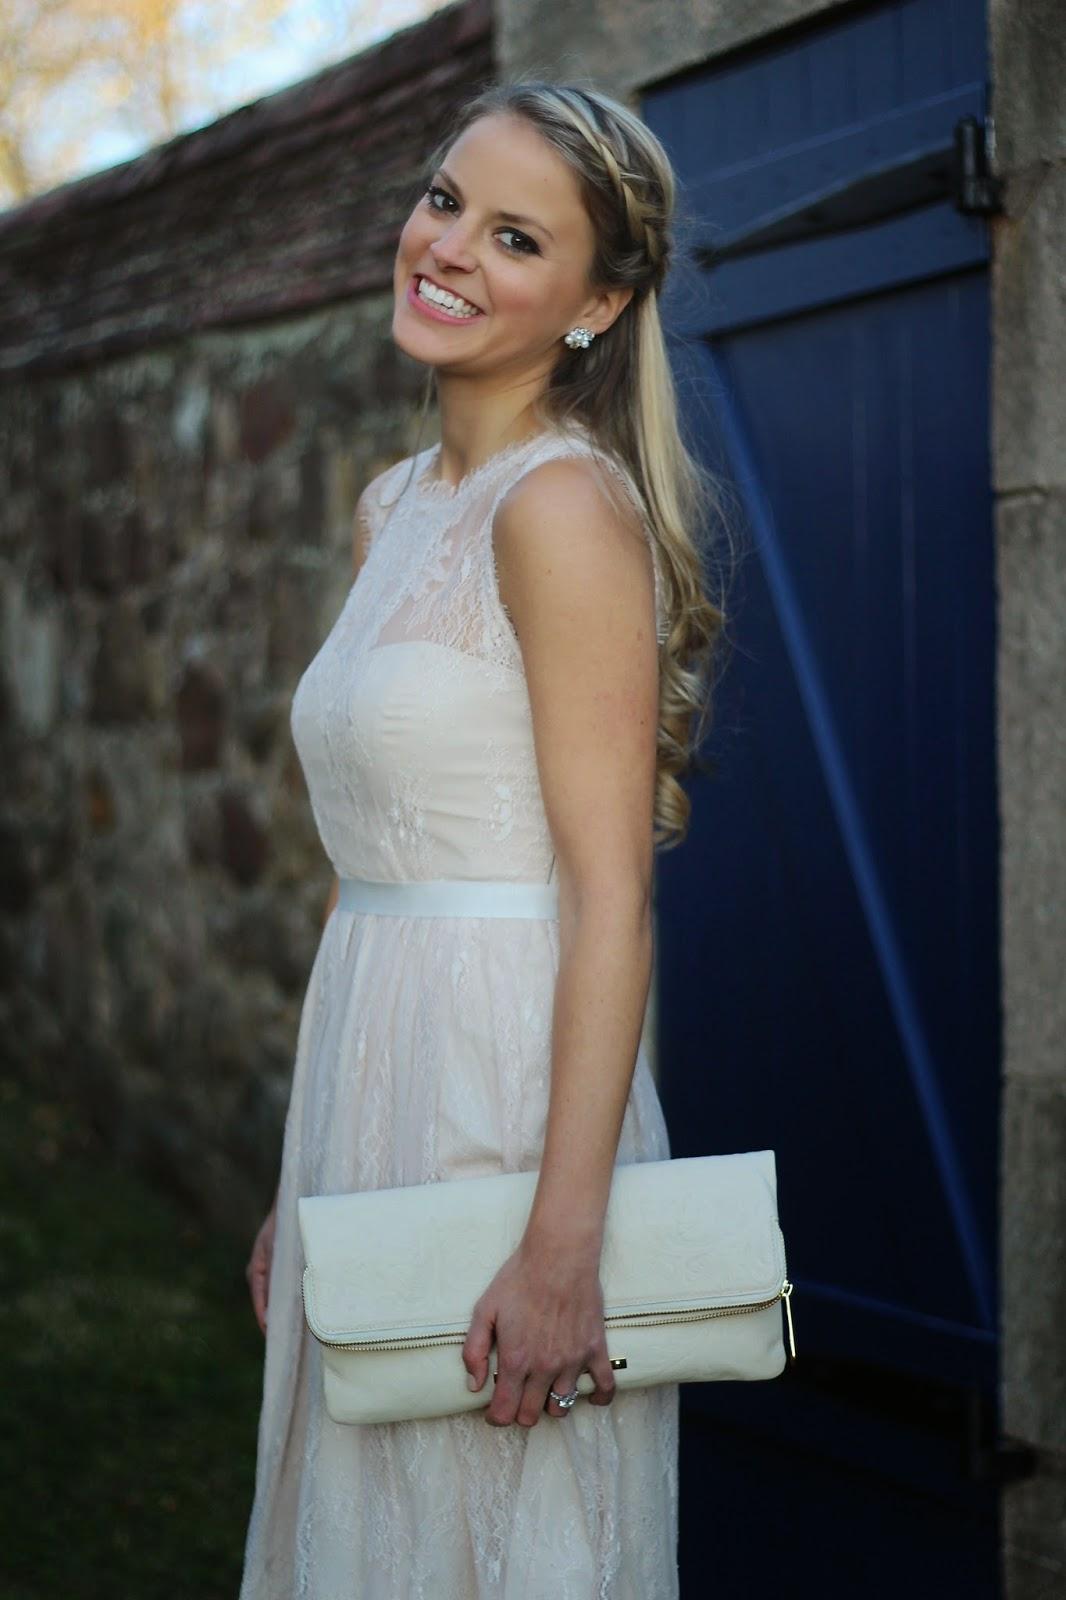 engagement party dress, bridal dress, wedding, bhldn, lace dress, bridal shower dress, bride, braids, braid hairstyles